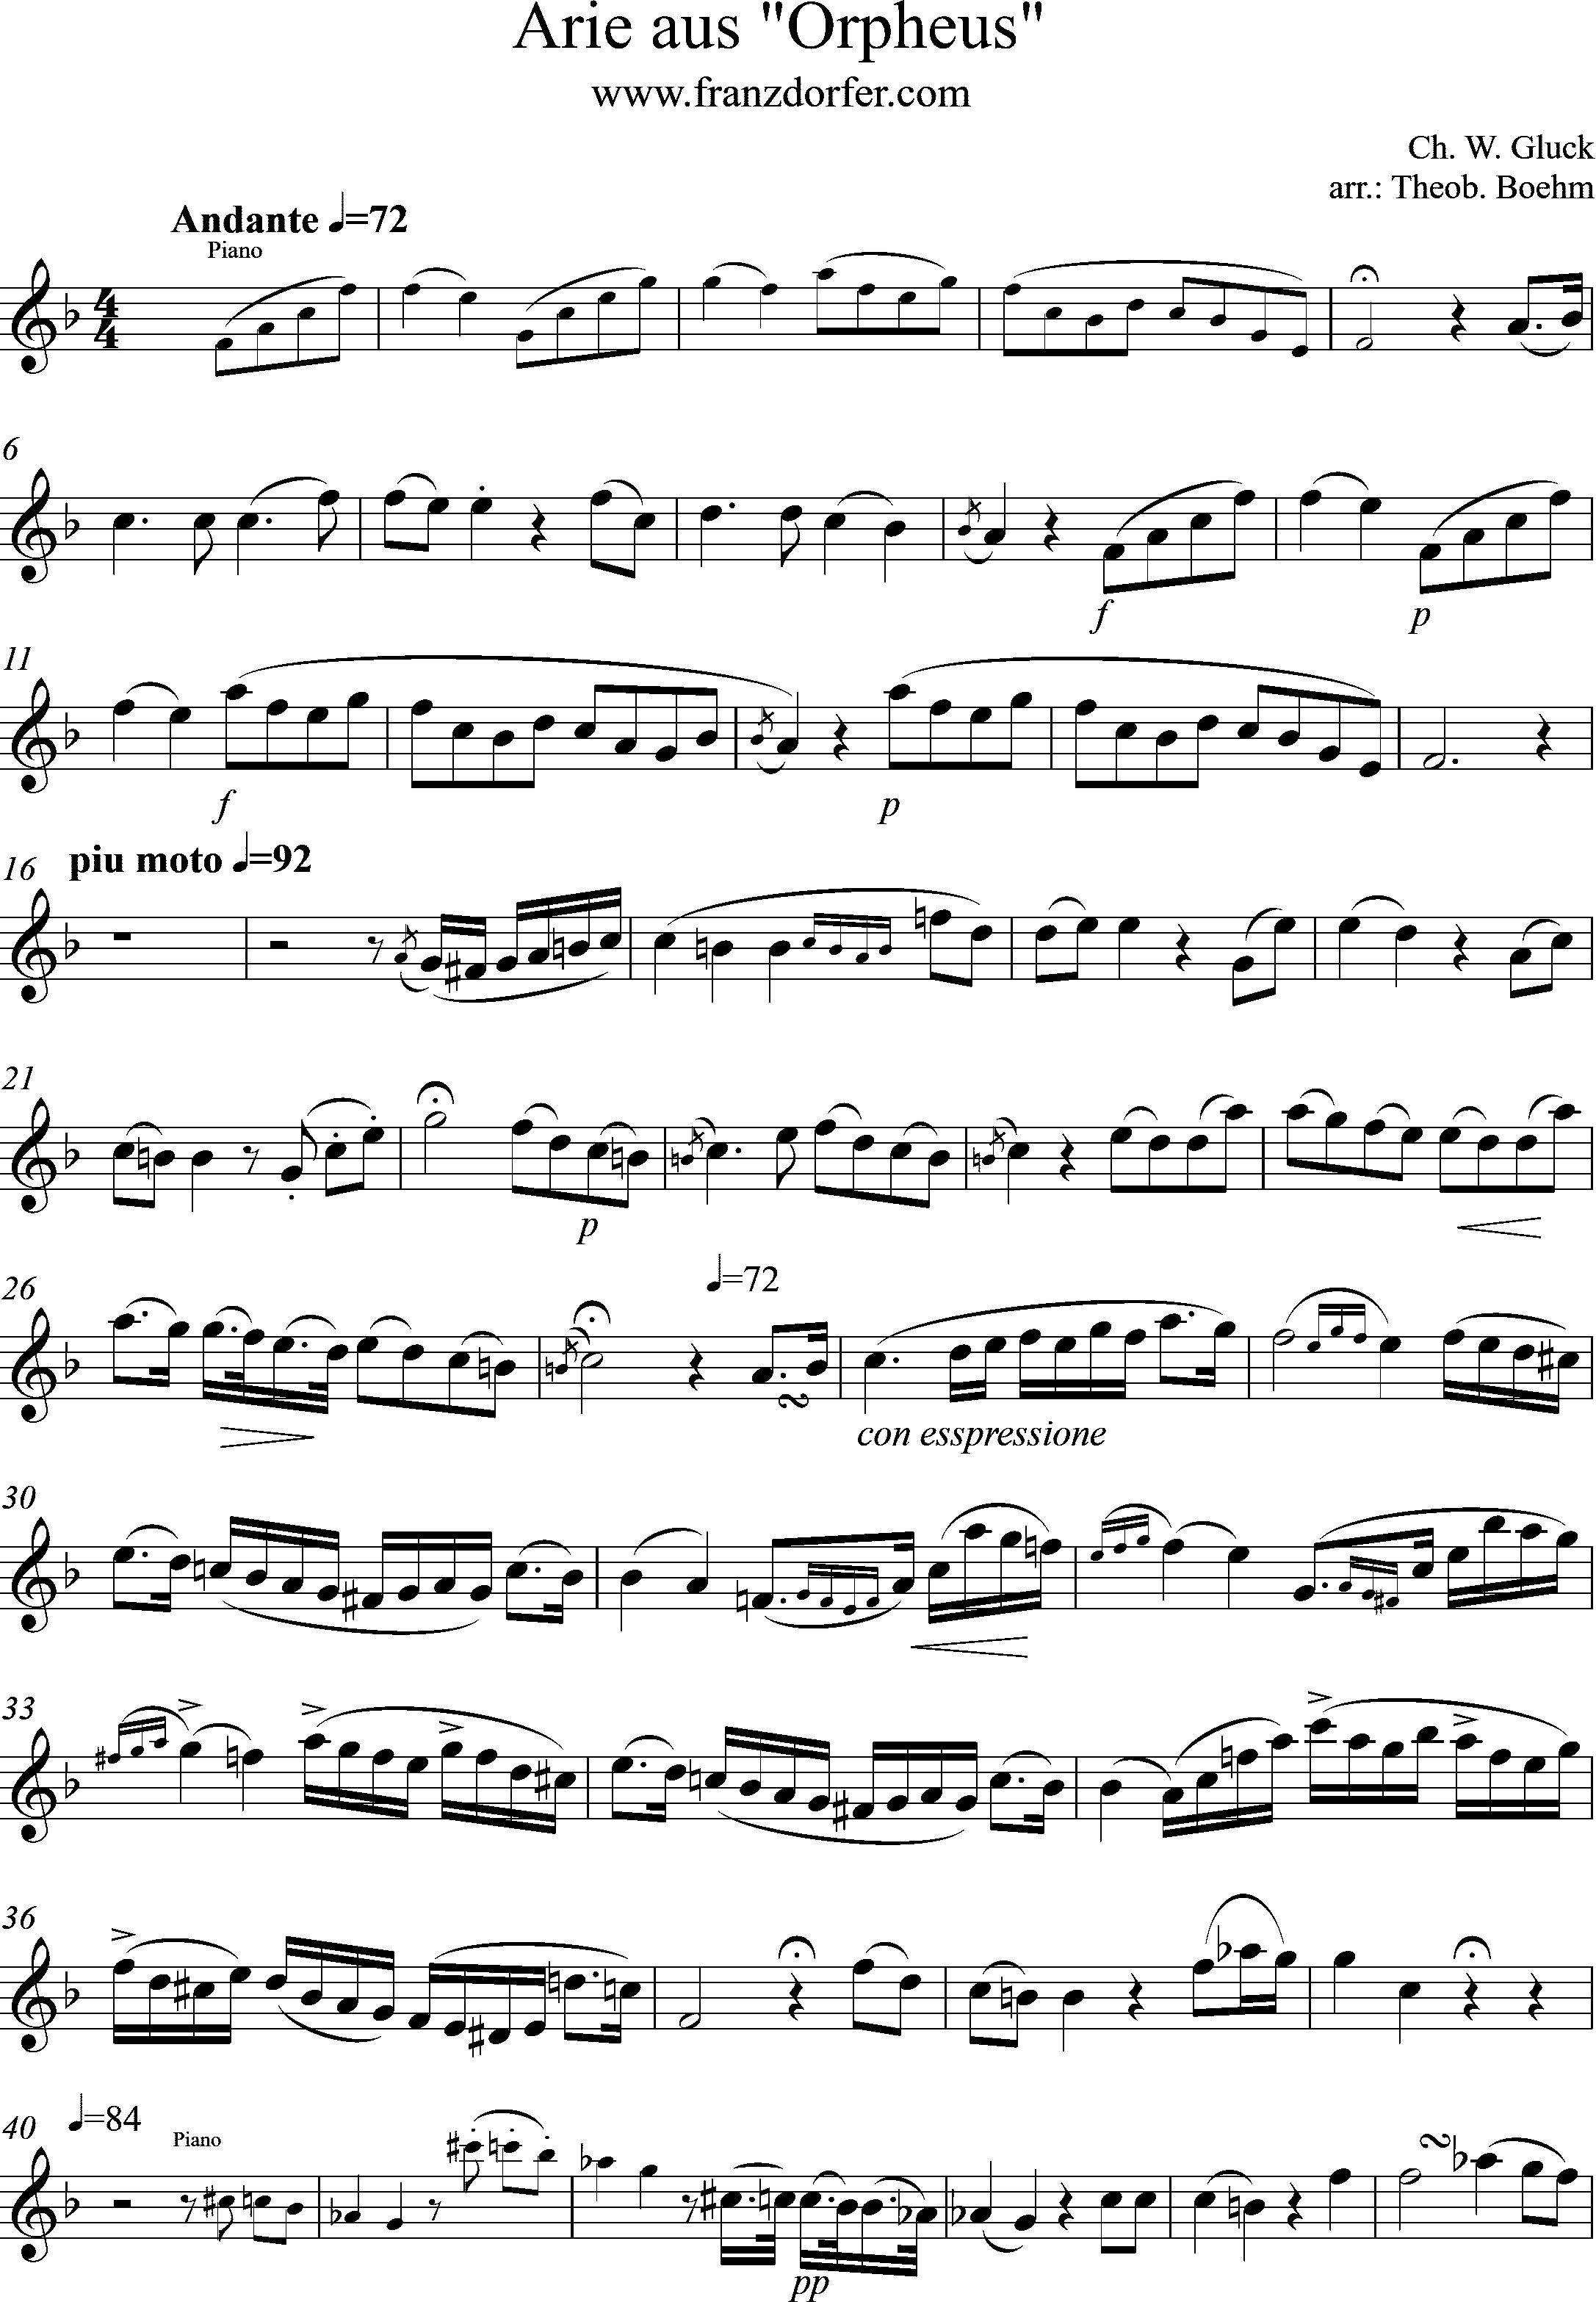 Freesheet Solopart Arie aus Orpheus